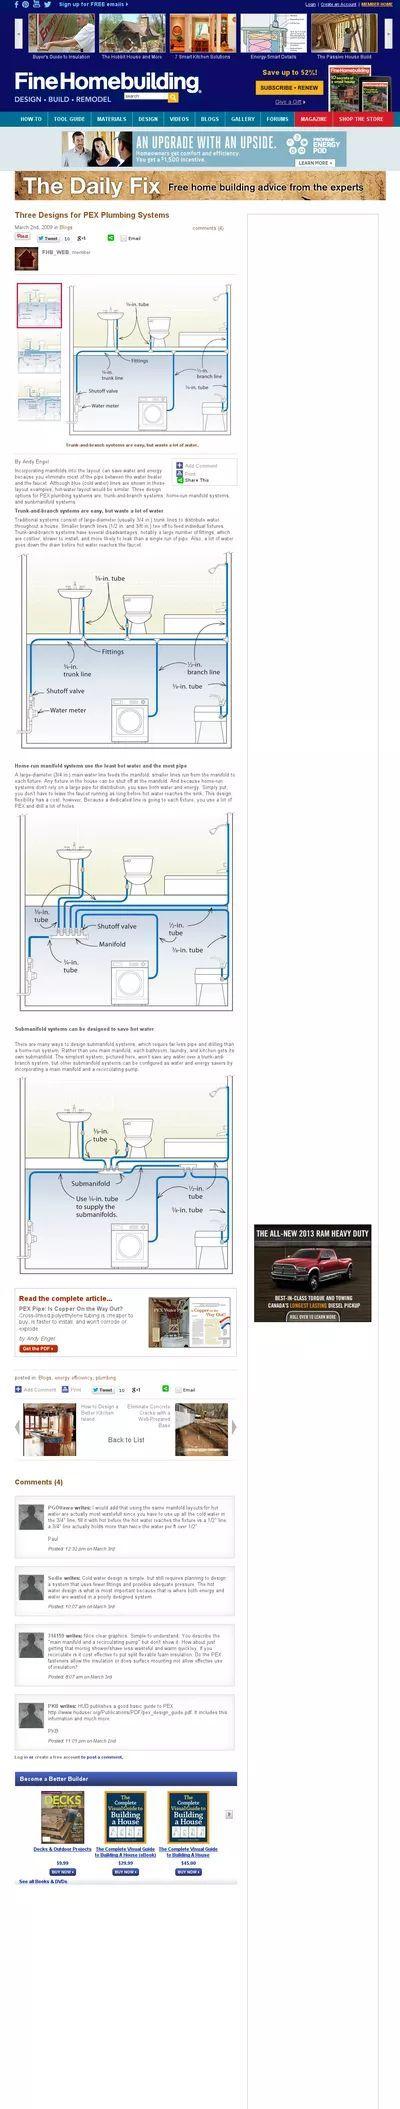 pex plumbing - Google Search